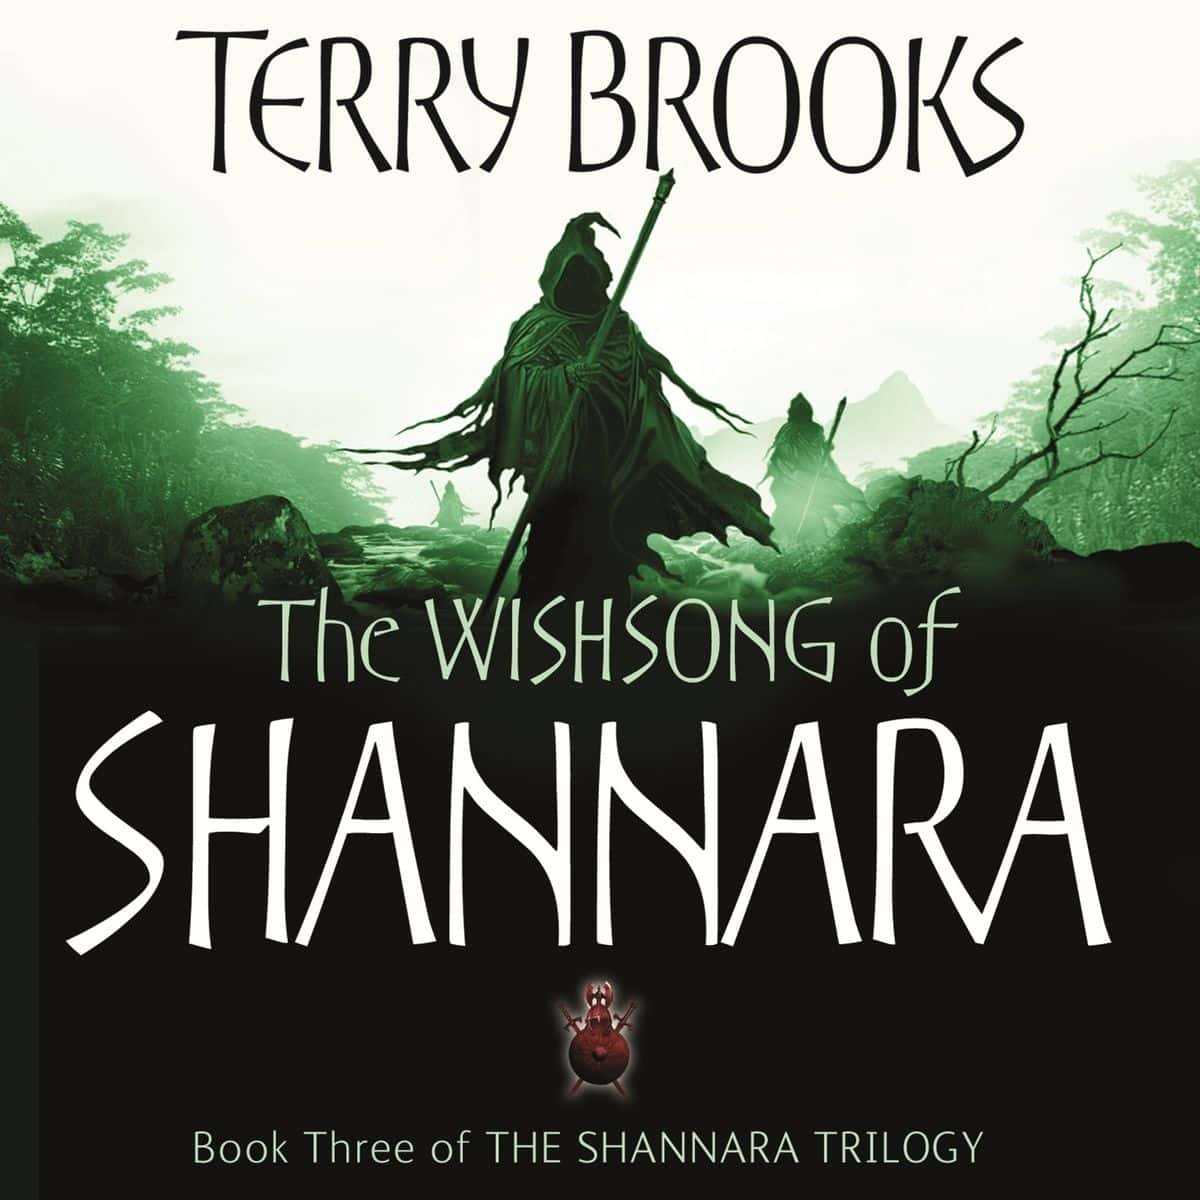 Wishsong of Shannara Audiobook Free Download